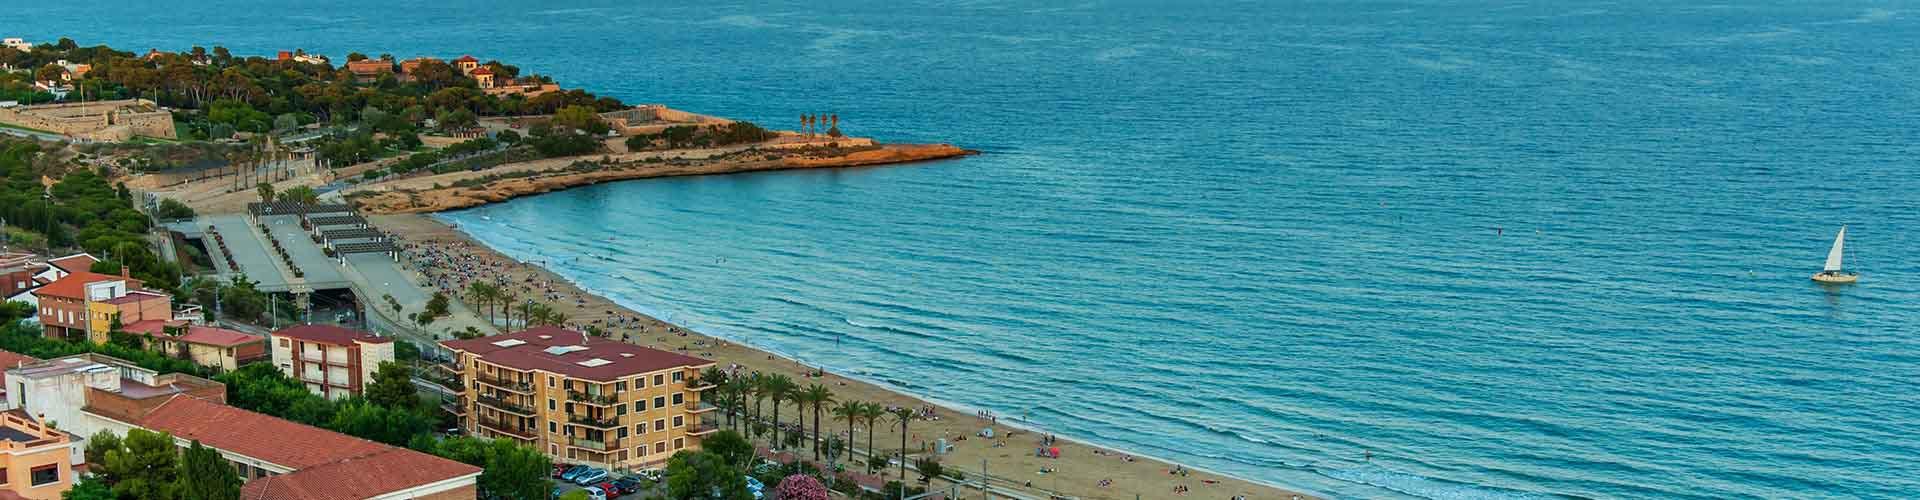 Tarragona - Apartamentos en Tarragona. Mapas de Tarragona, Fotos y comentarios de cada Apartamento en Tarragona.